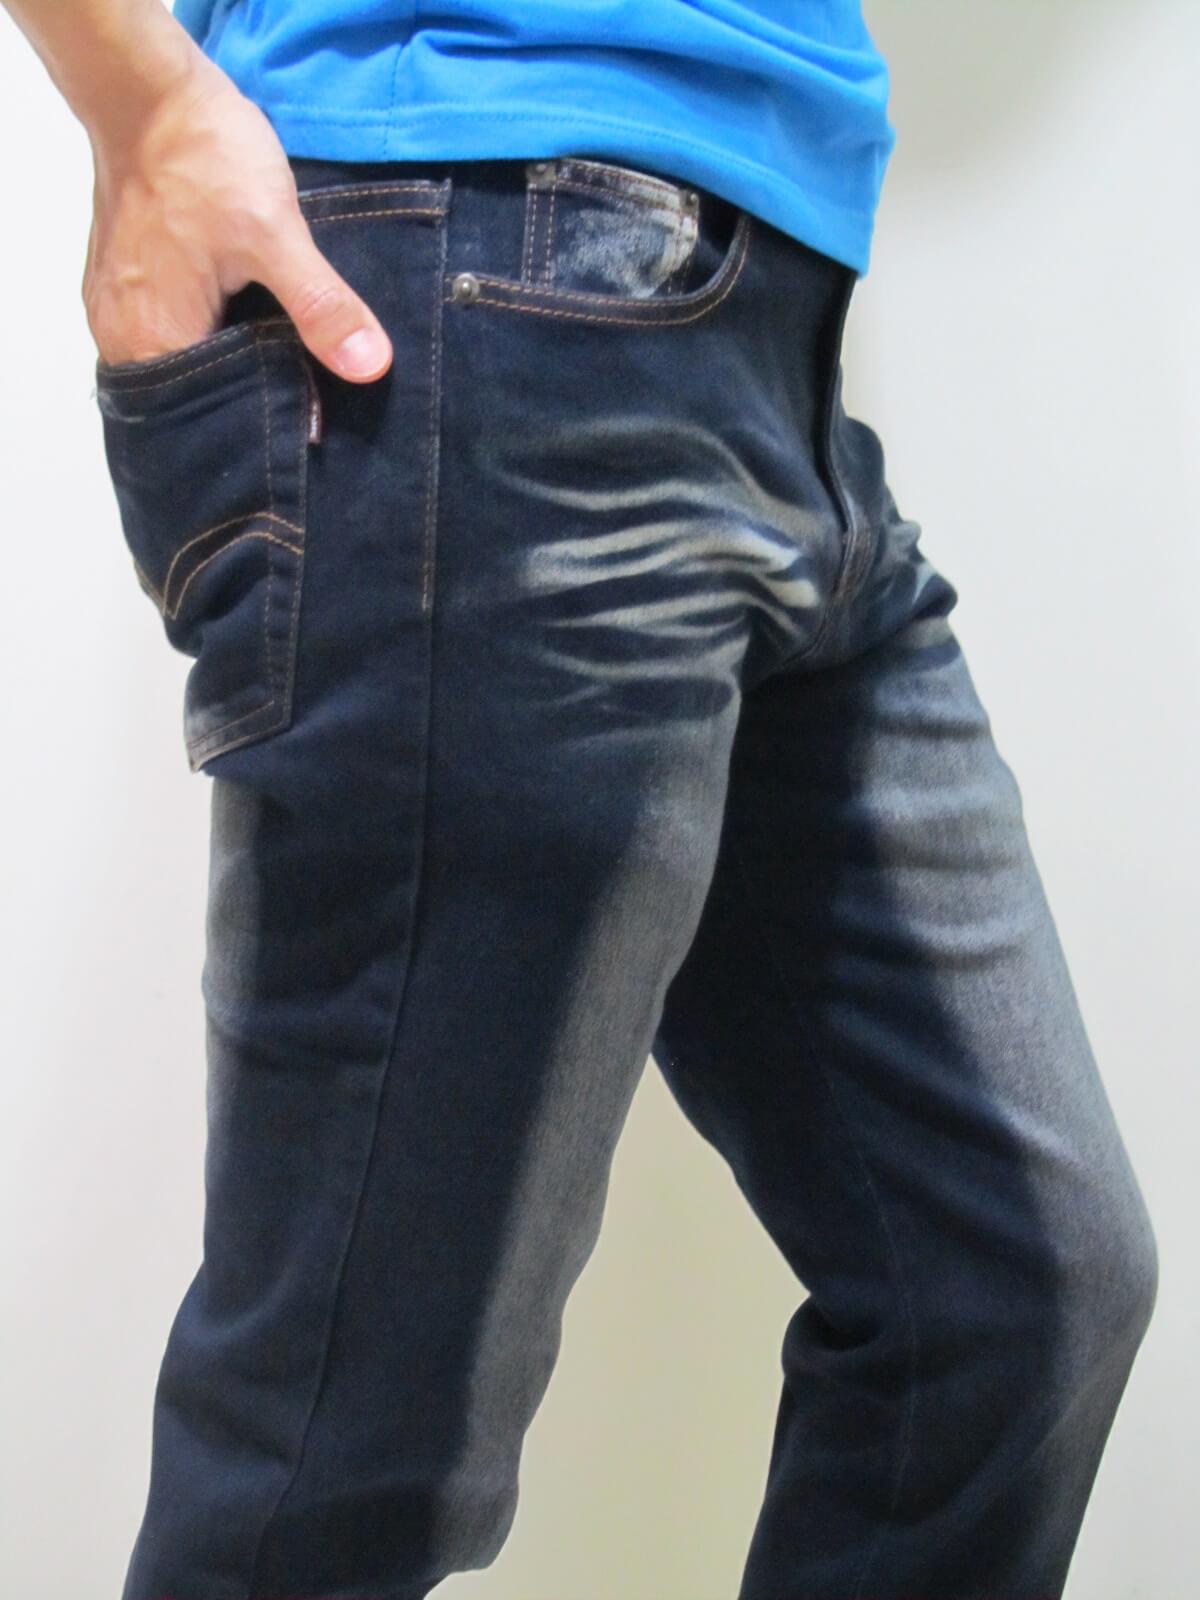 sun-e貓爪刷白牛仔褲、伸縮直筒修身牛仔長褲、顯瘦丹寧長褲、彈力牛仔長褲(307-7013-21)黑 腰圍:M L XL 2L 3L 4L(28~39英吋) 1